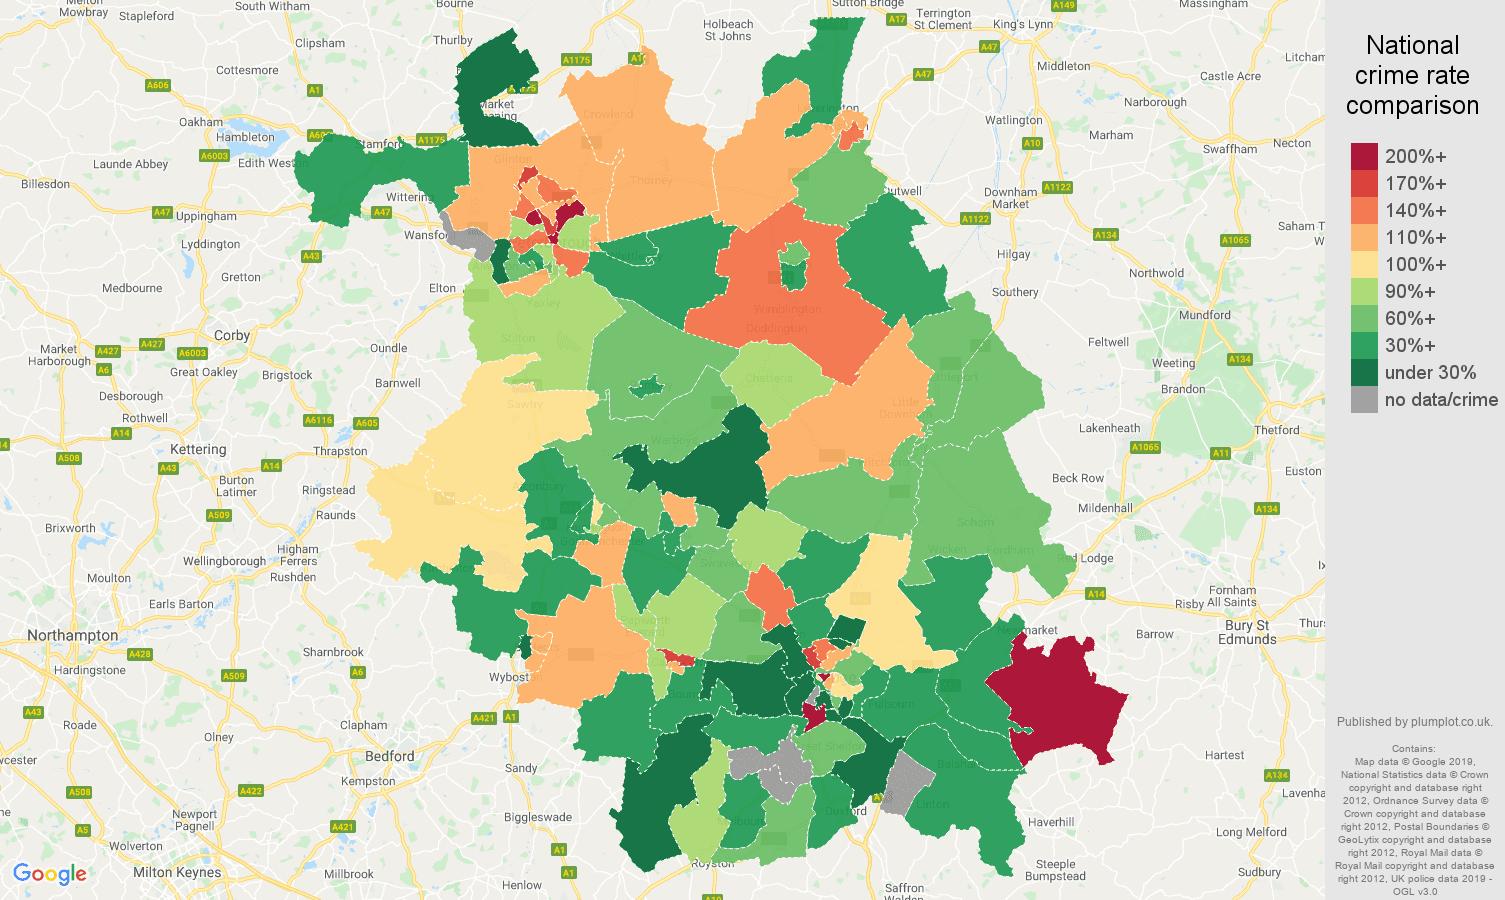 Cambridgeshire other crime rate comparison map